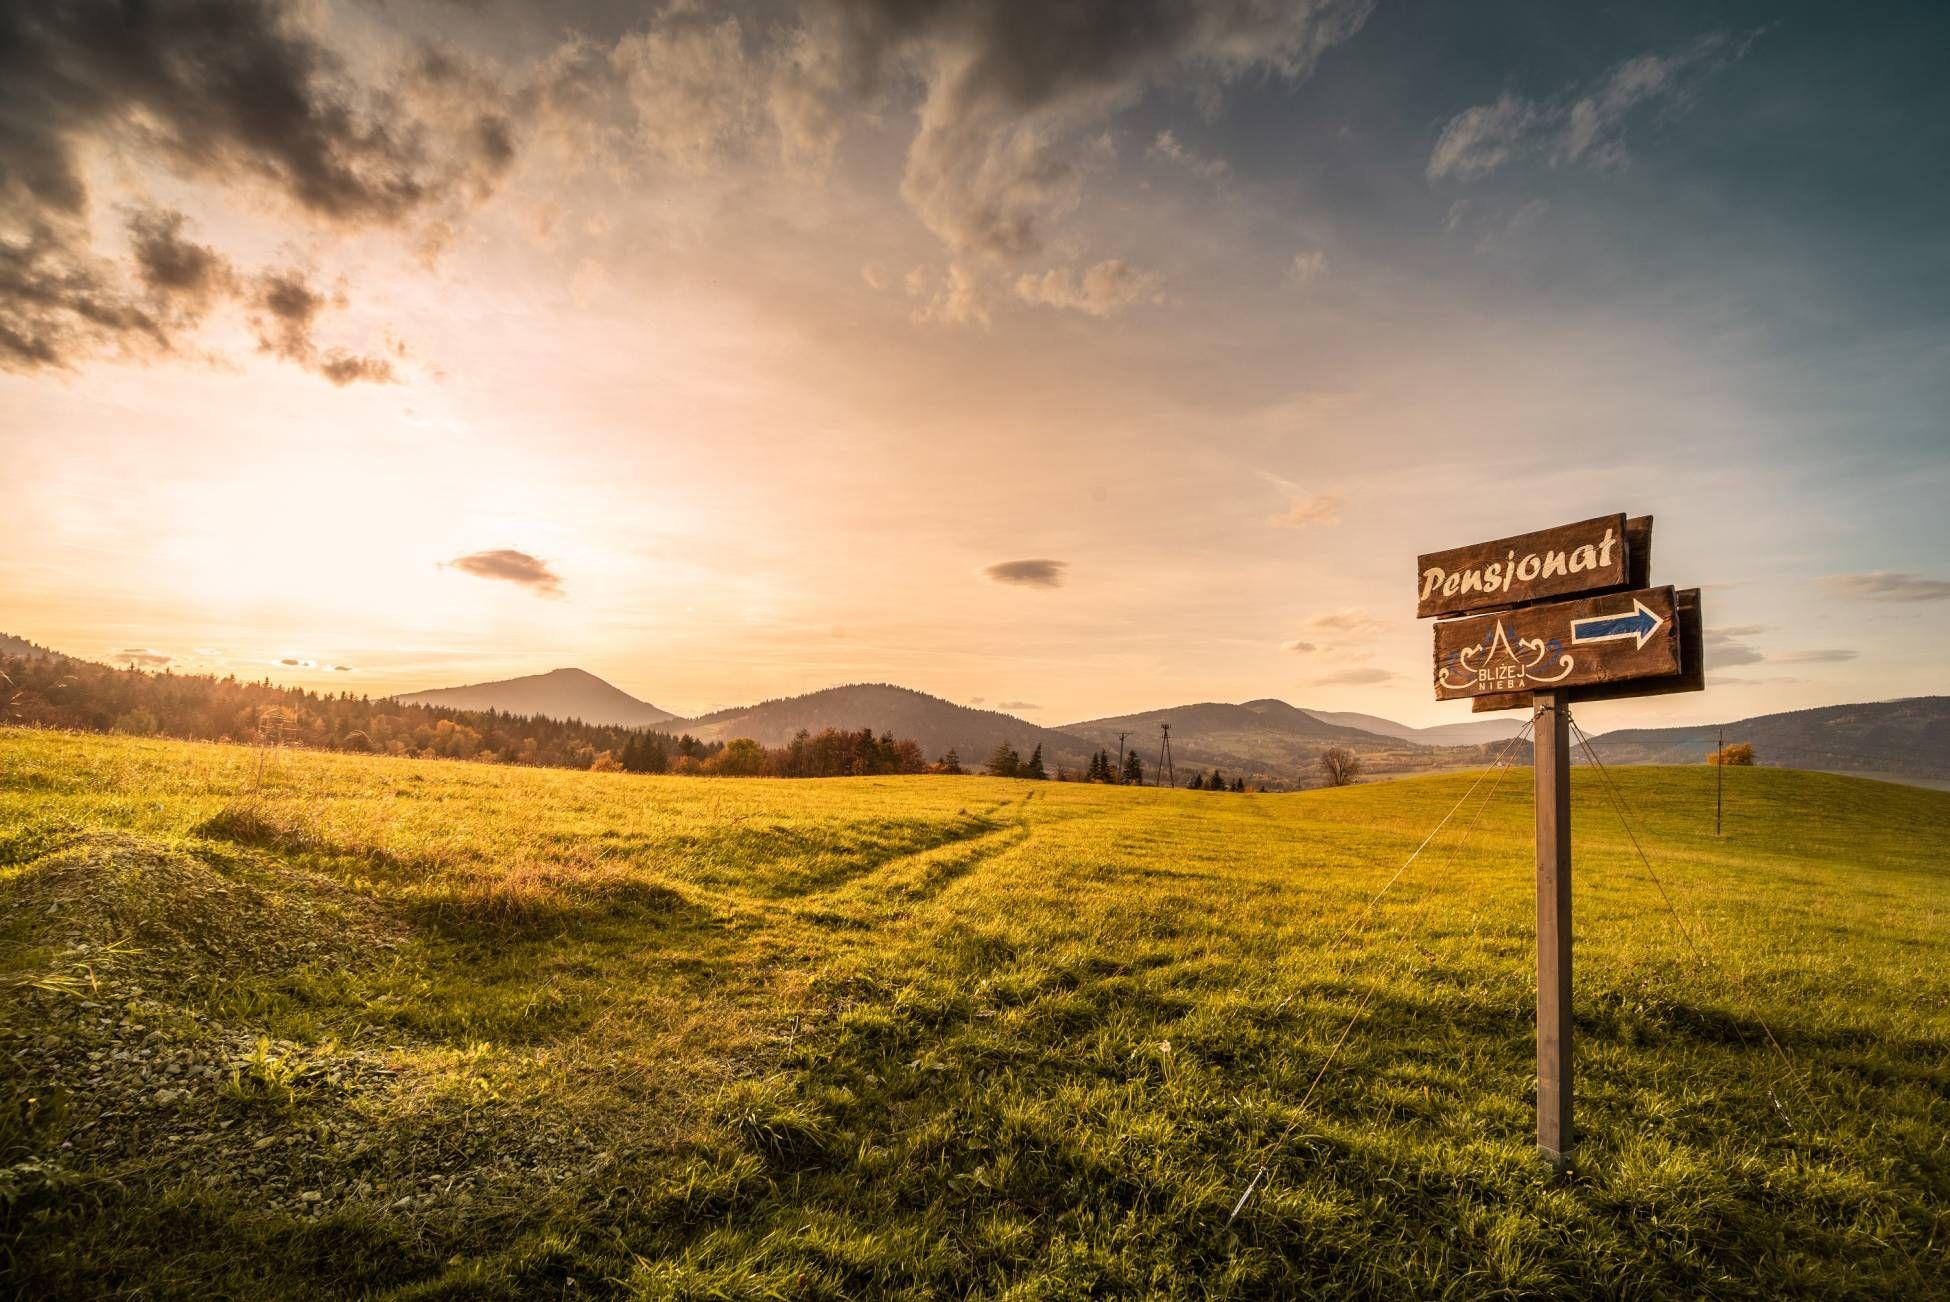 krajobraz-pensjonat-blizej-nieba-wola-skrzydlanska(15)